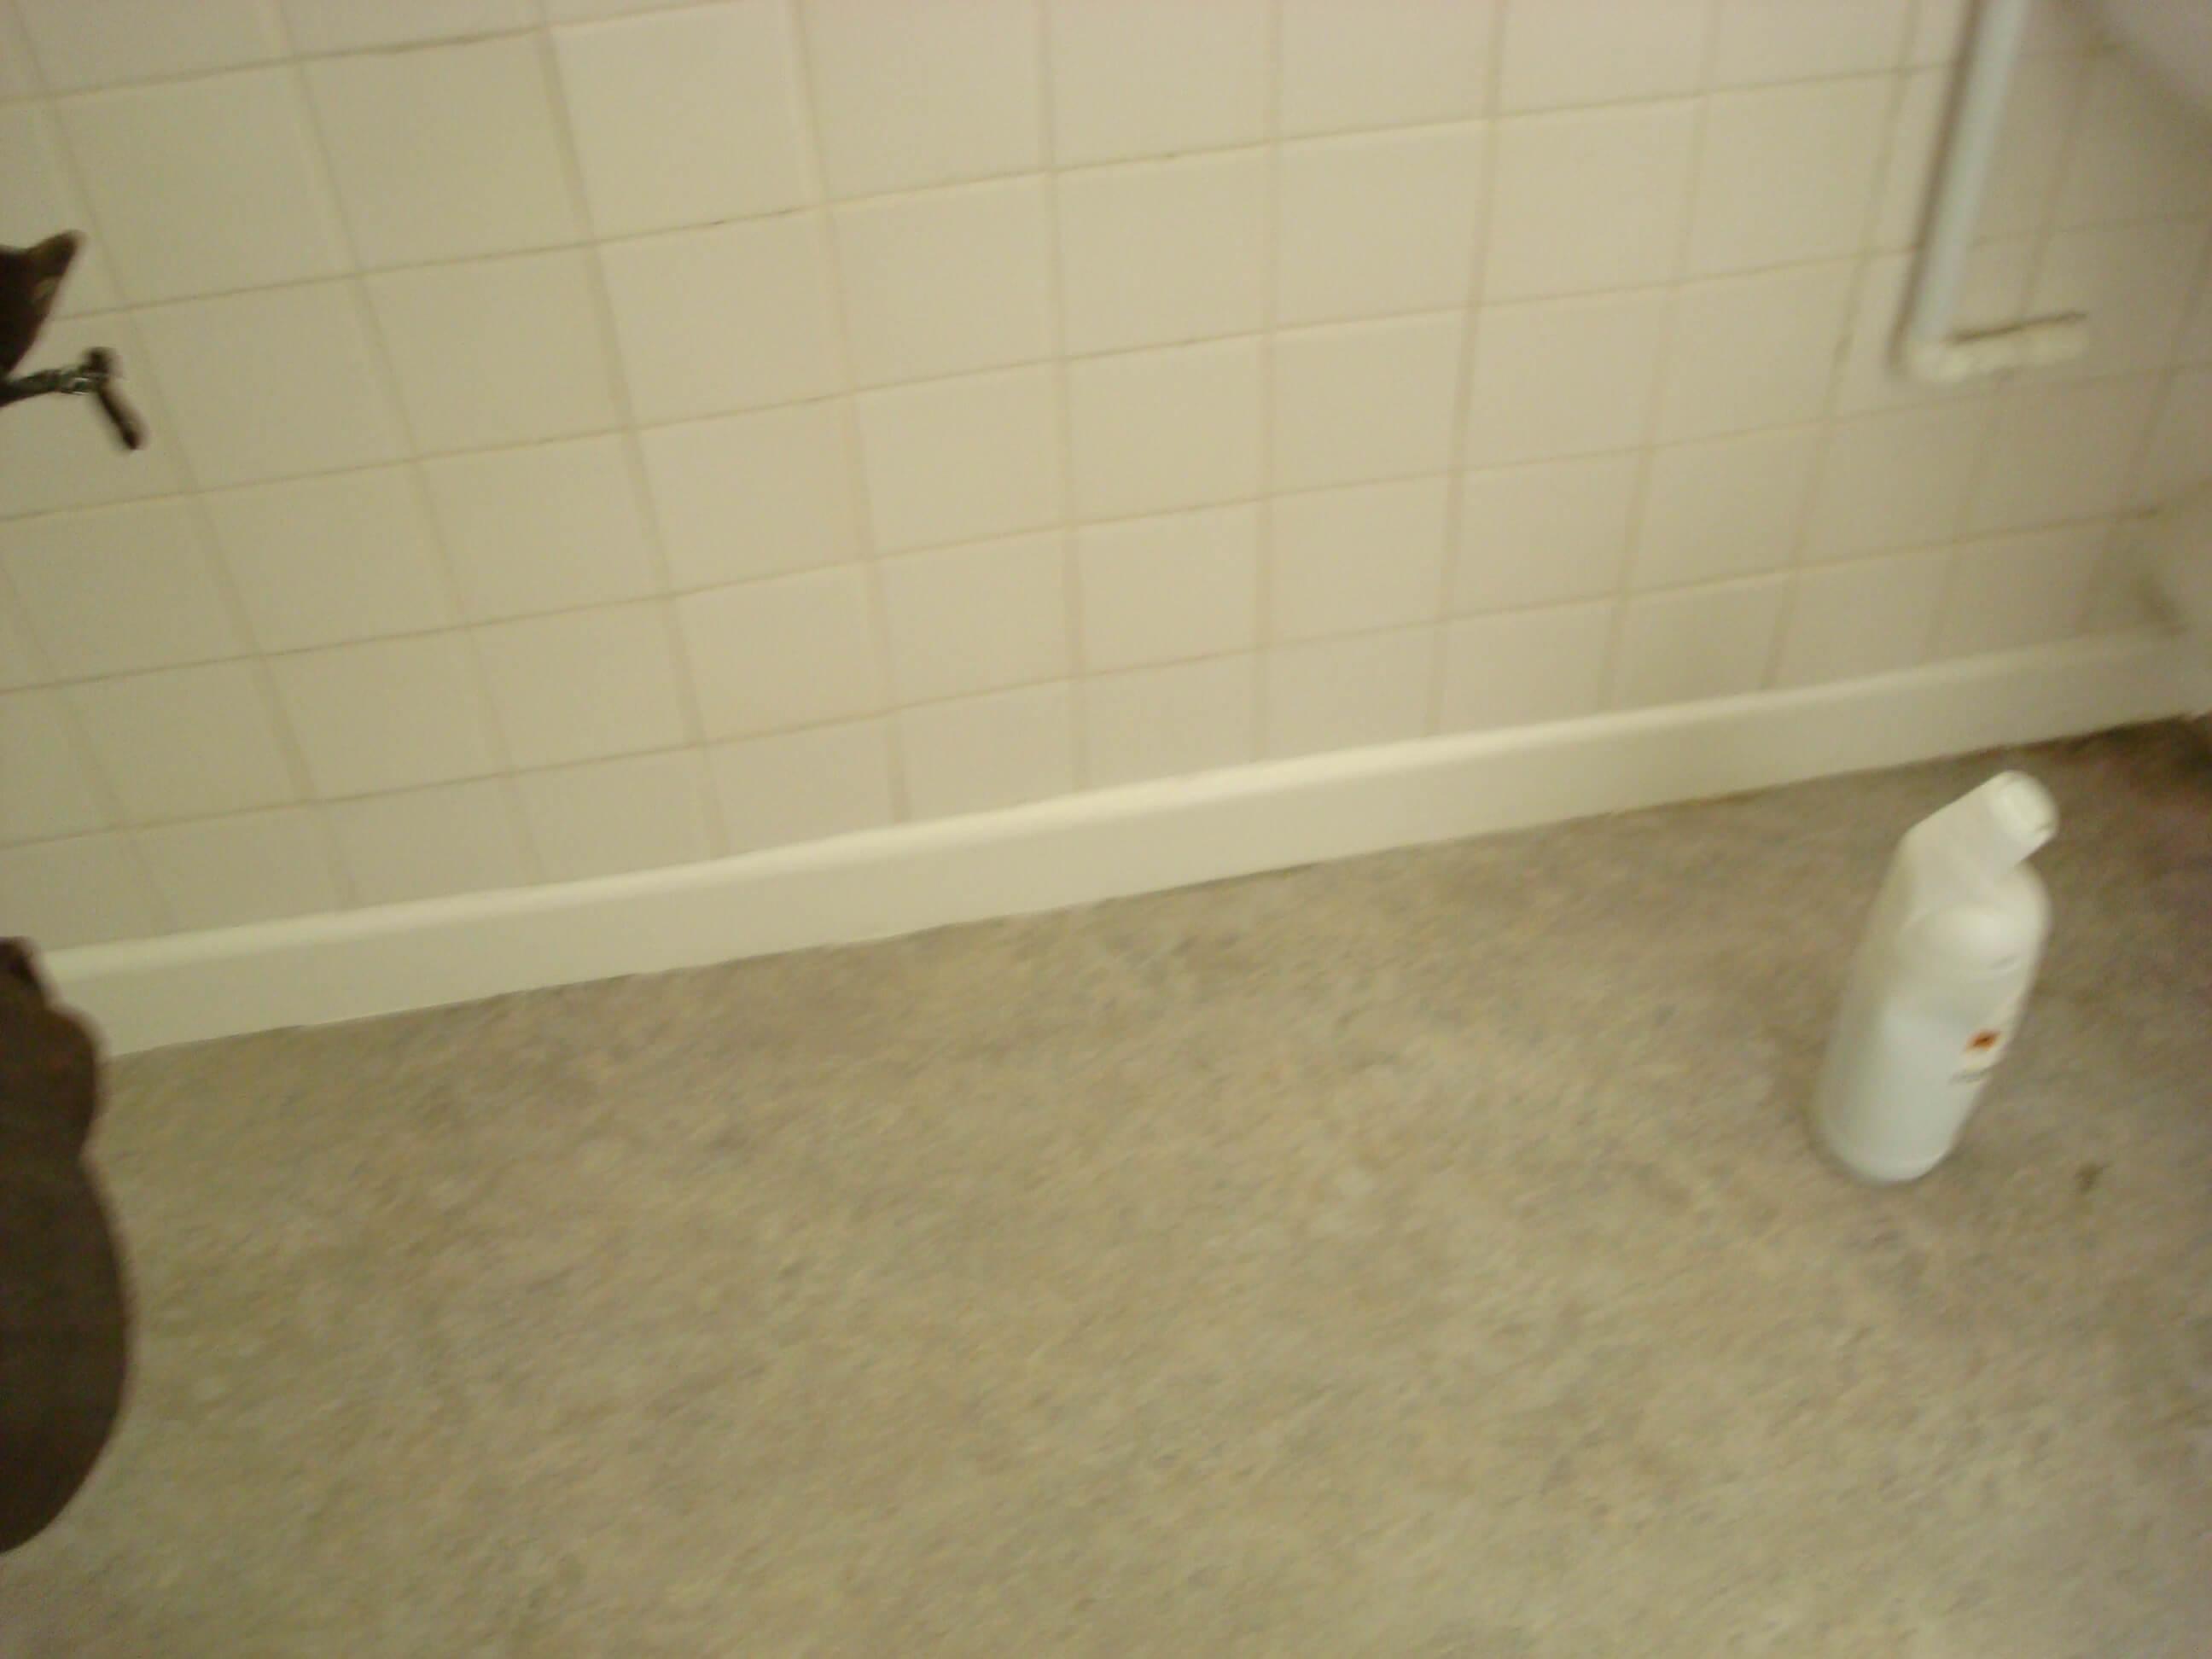 Toilet Refurbishment in Chiippenham